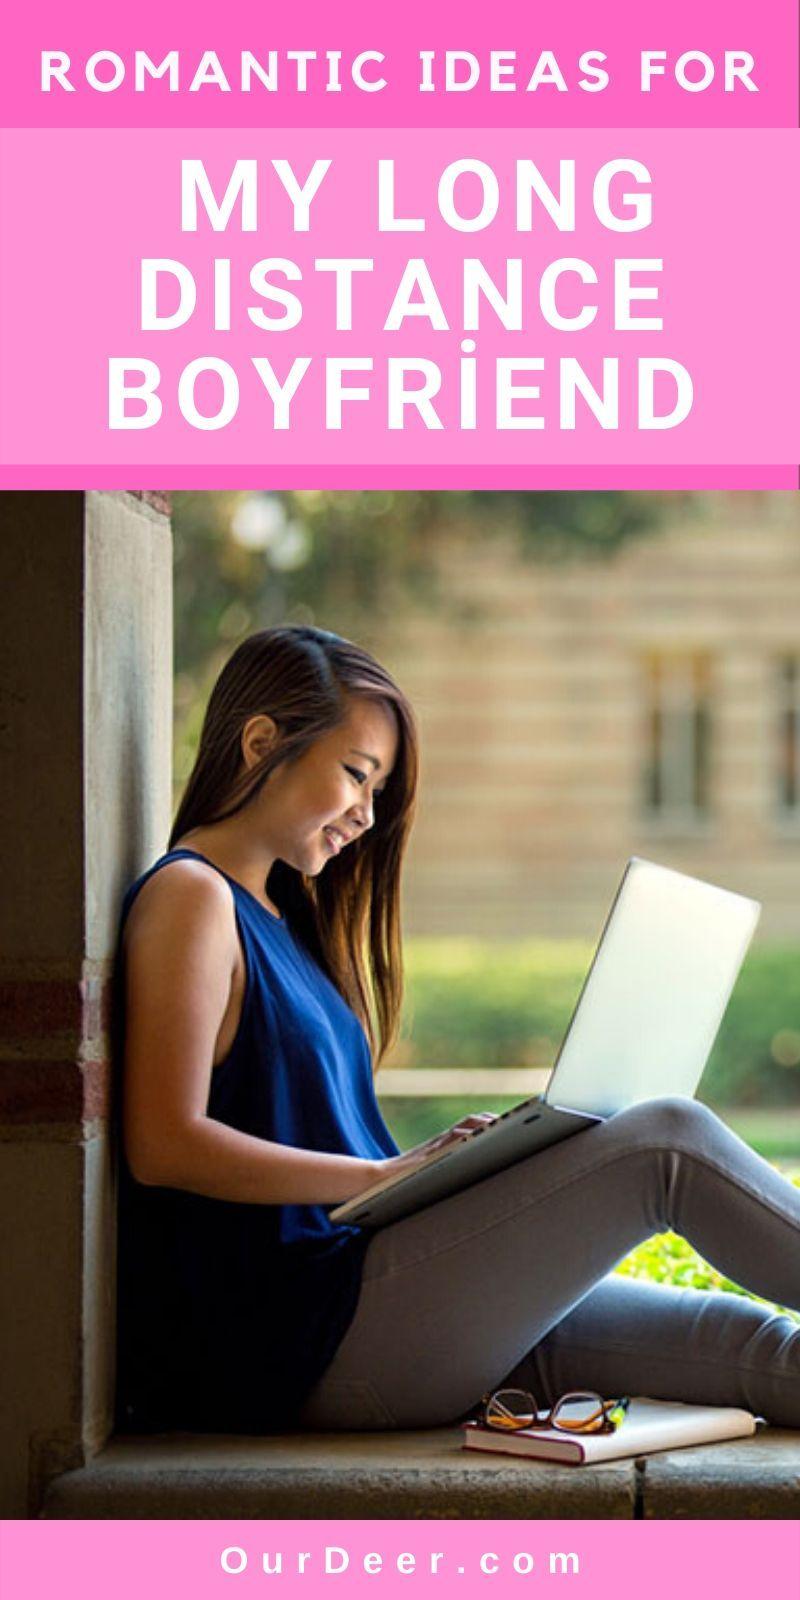 Romantic Ideas For My Long Distance Boyfriend Our Deer